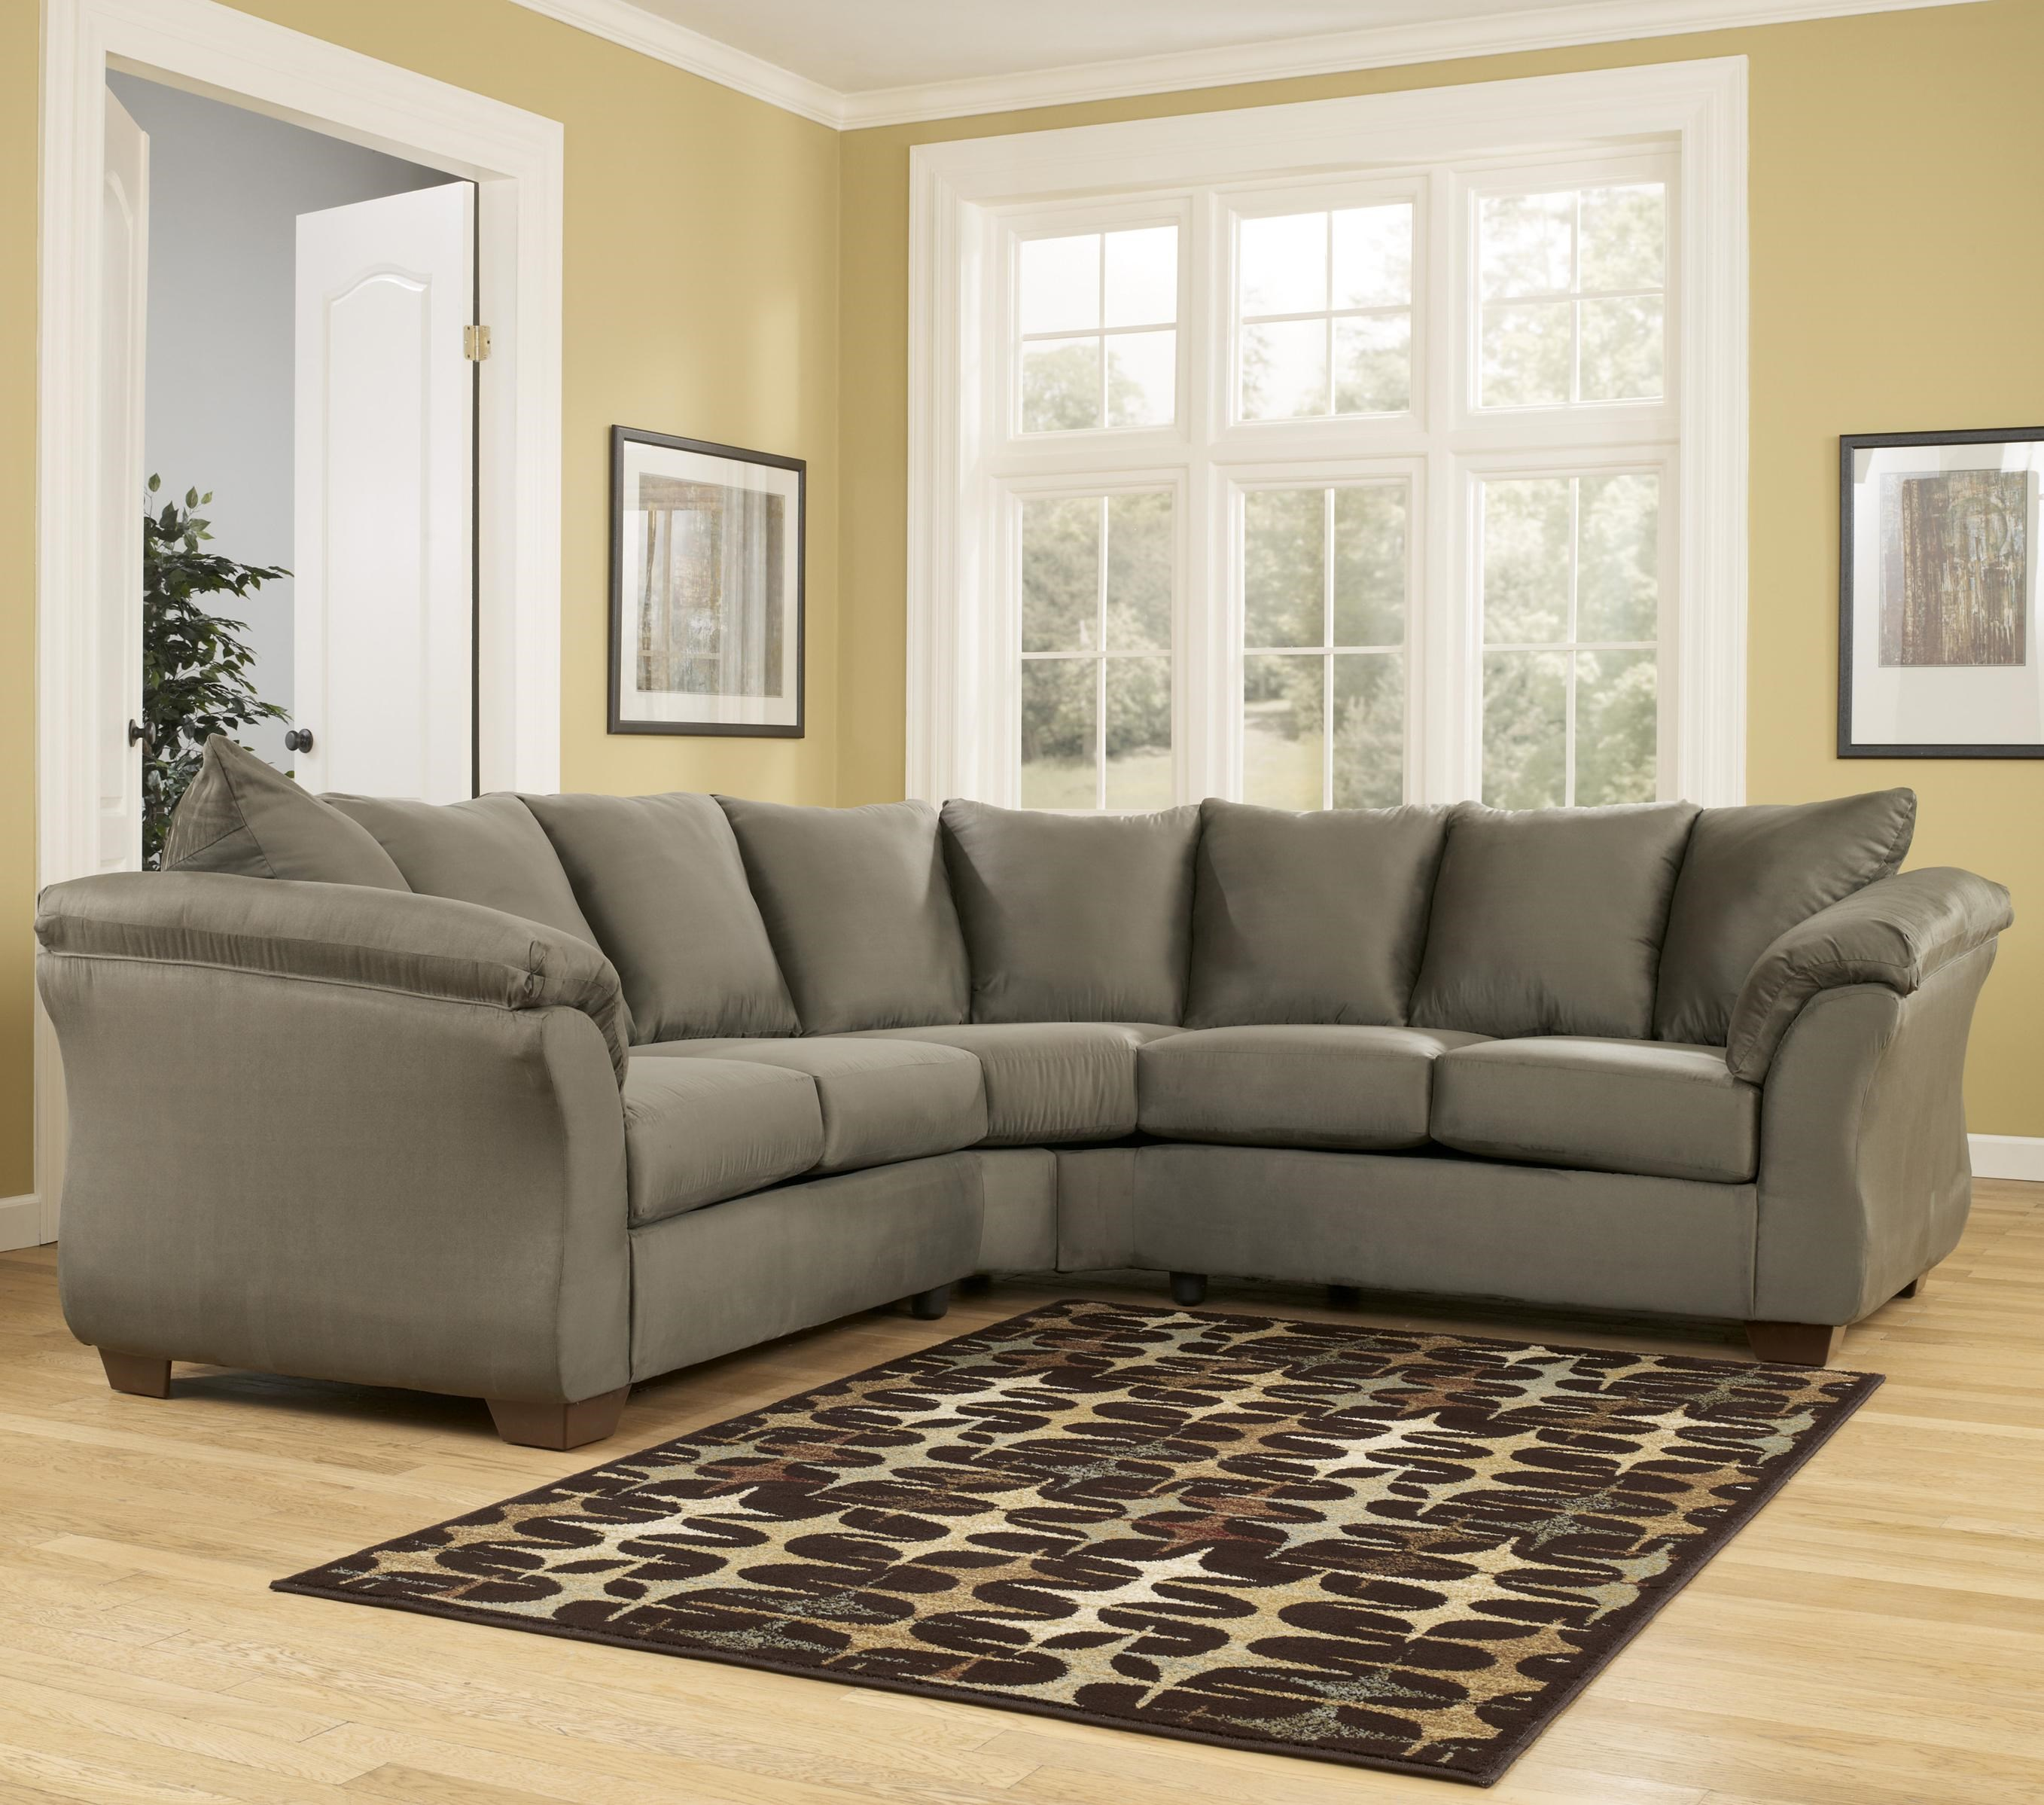 ashley furniture sectional sofas